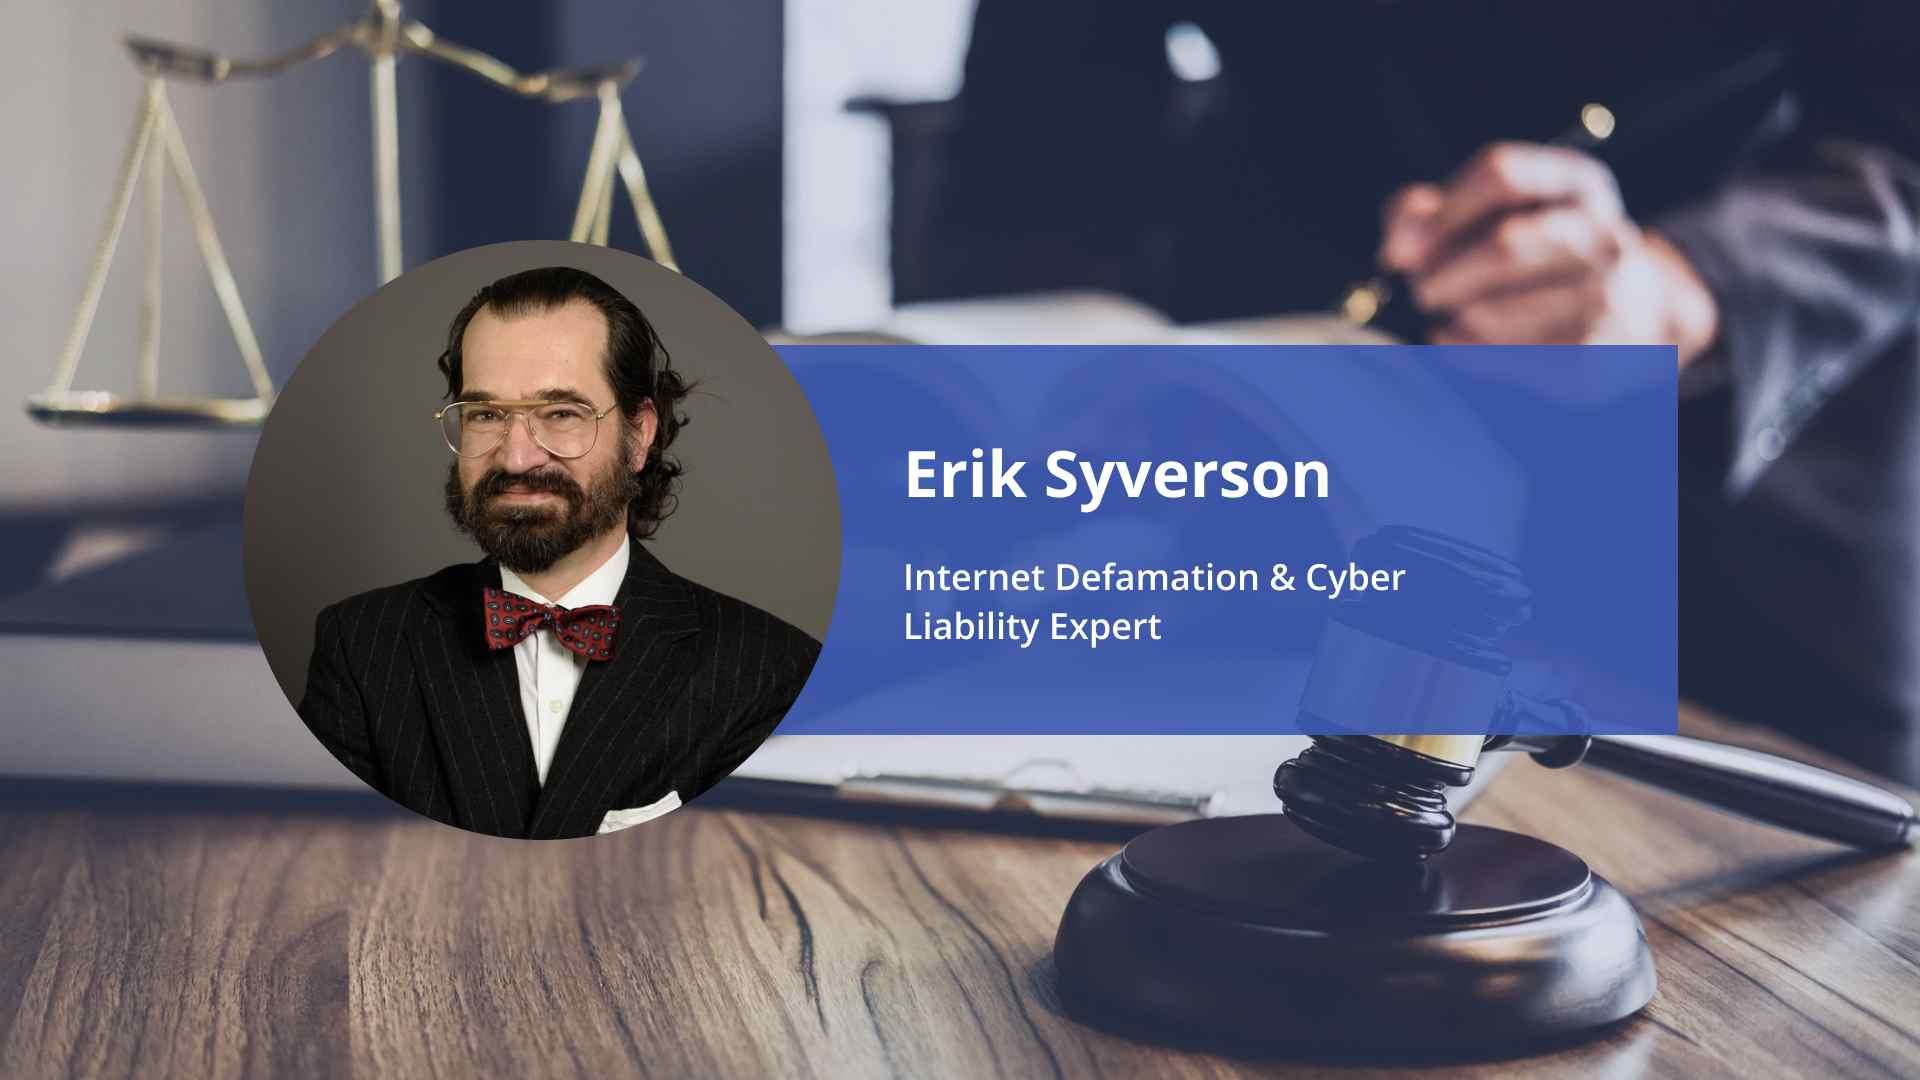 Erik Syverson-Internet Defamation & Cyber Liability Expert Interview-Blue Ocean Global Technology